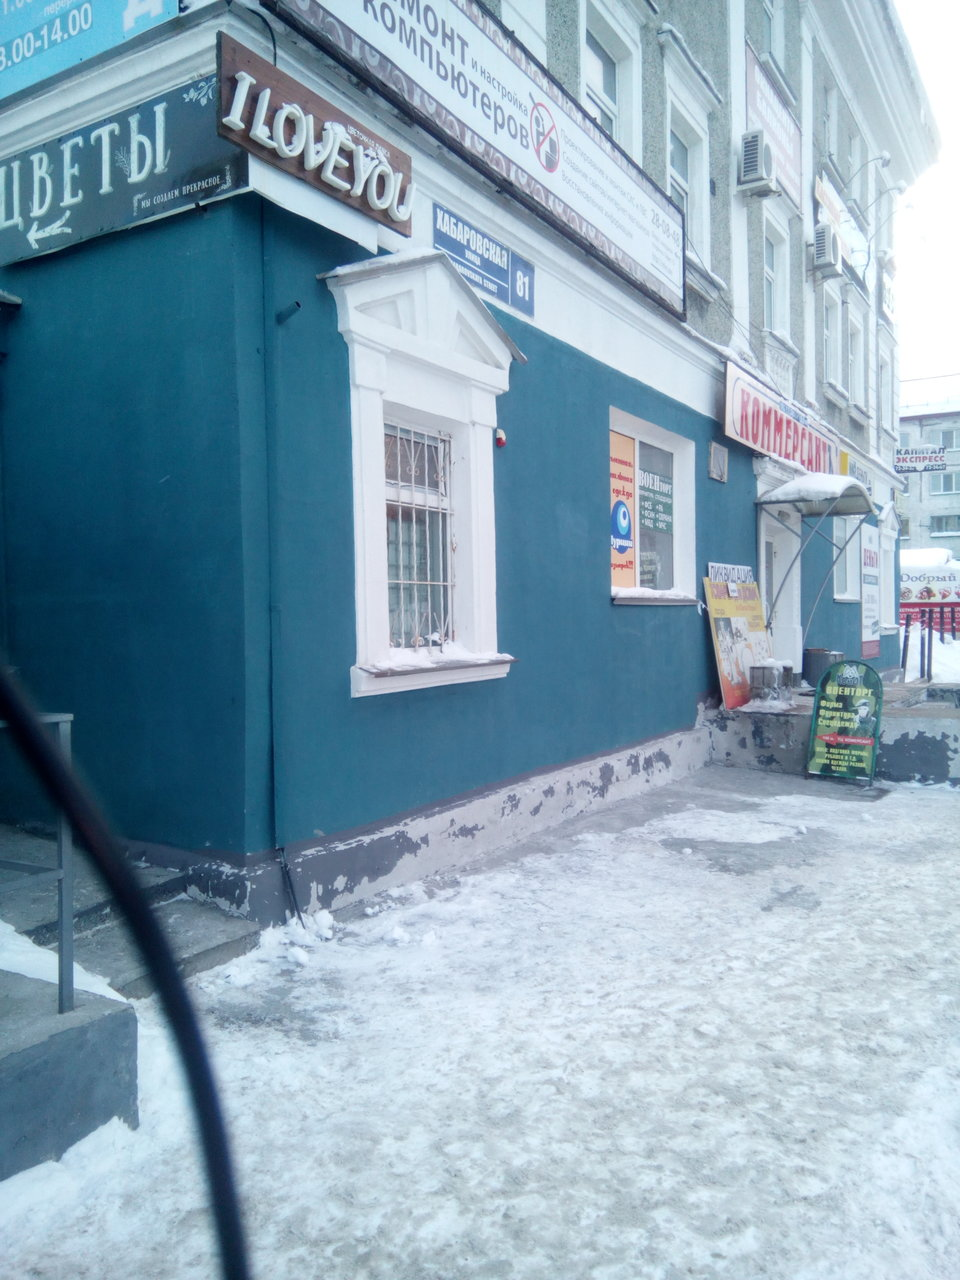 Южно сахалинск ломбард звезда продам часы